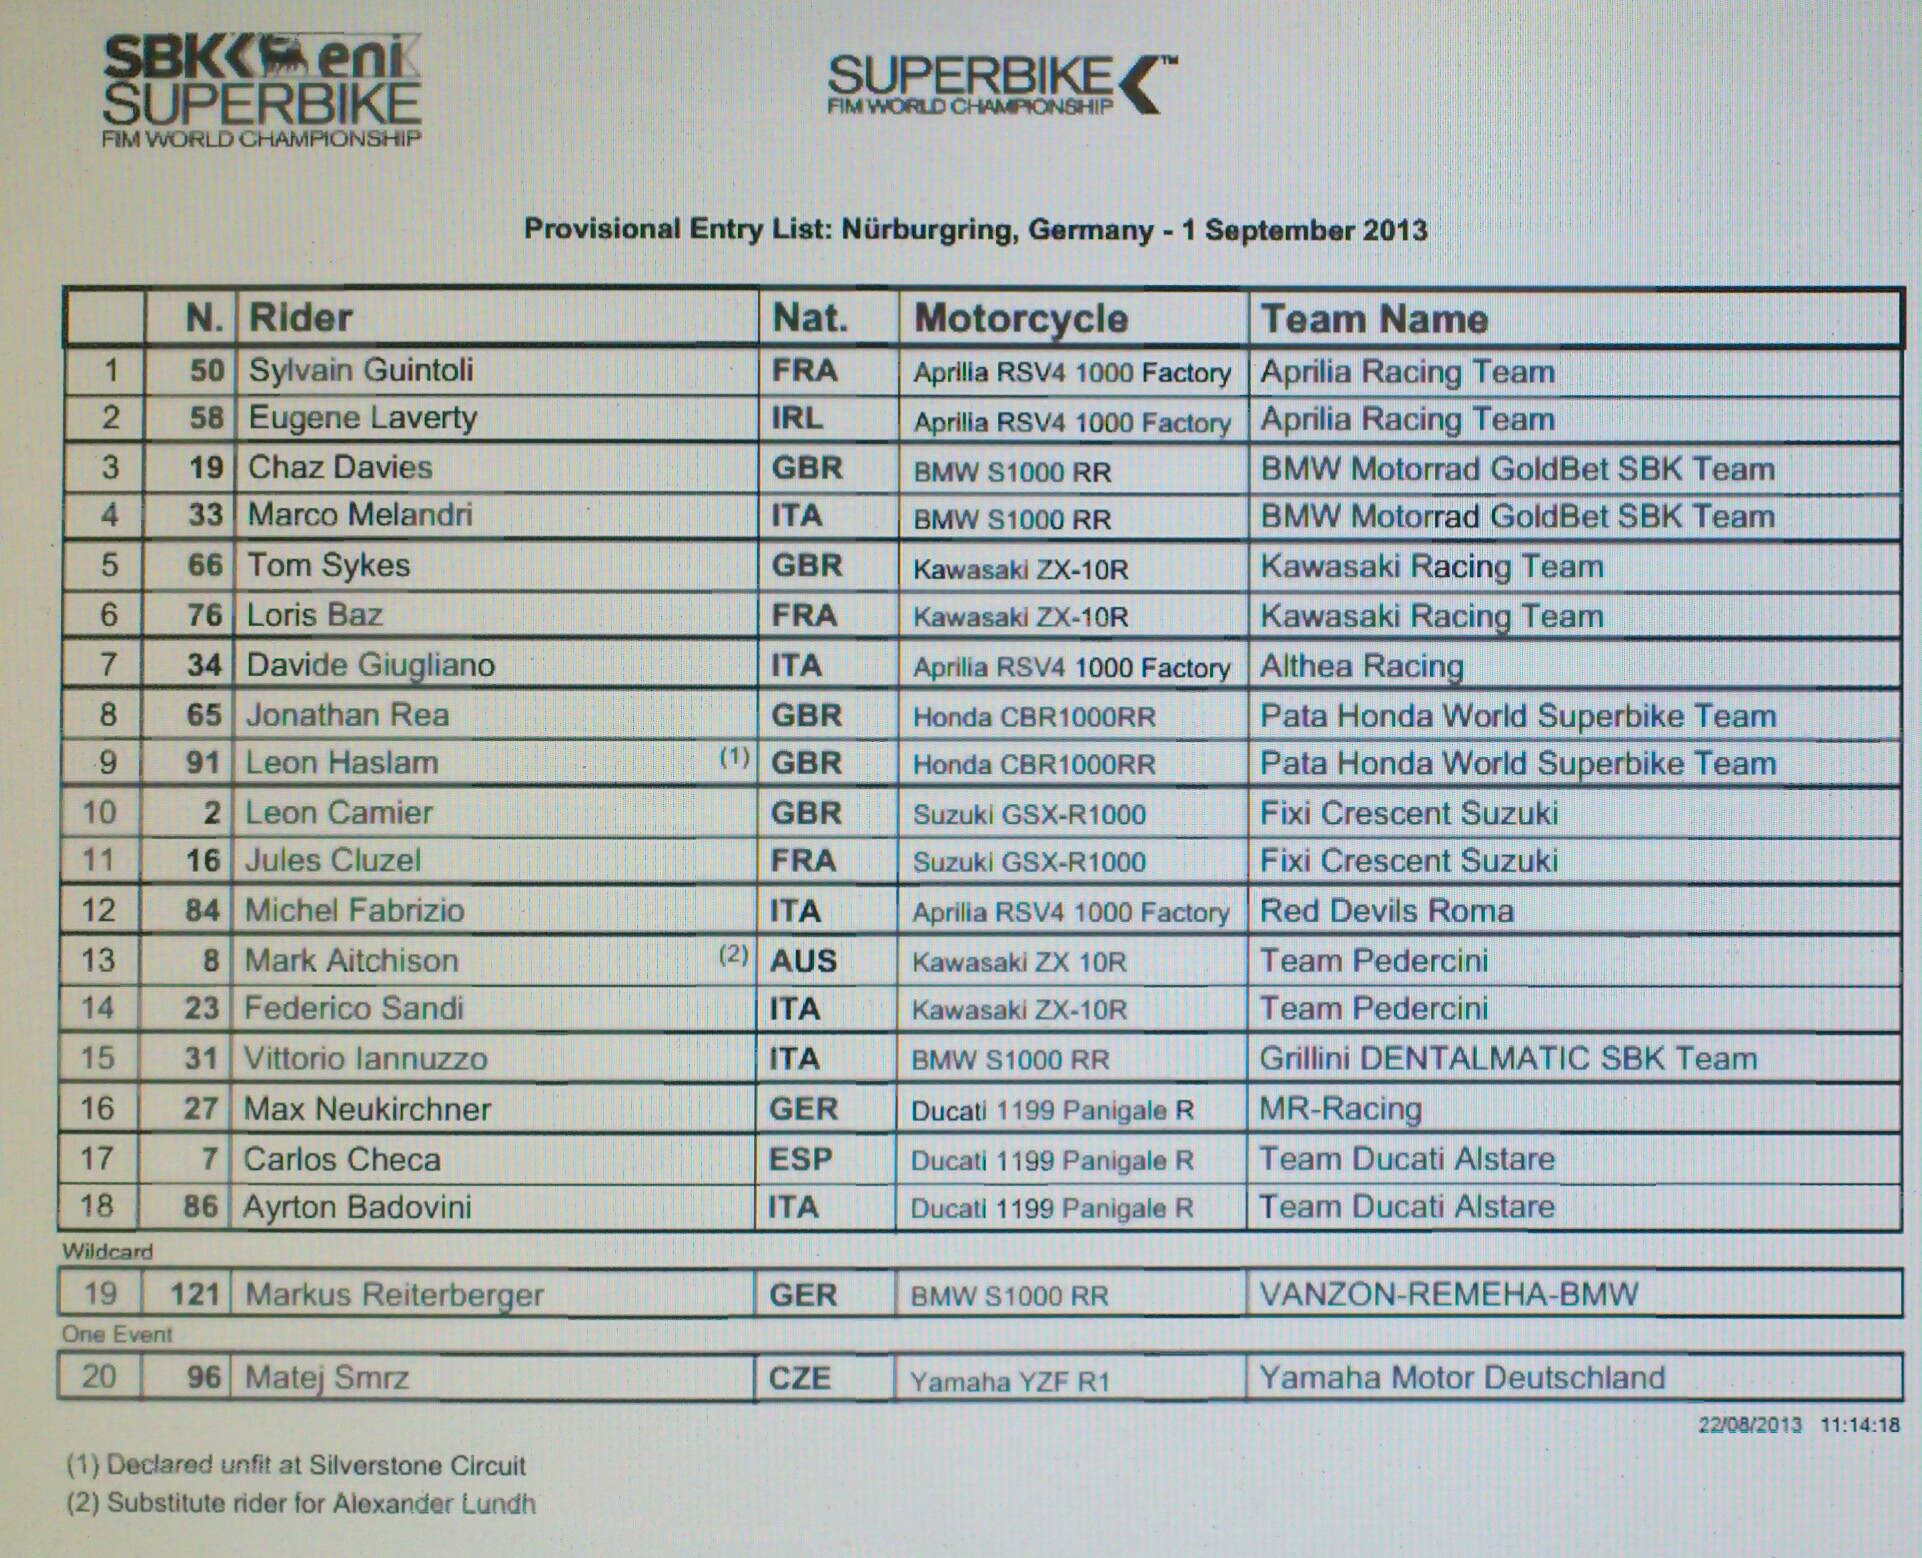 Vittorio_Iannuzzo_Grillini_Dentalmatic_SBK_BMW_S1000RR_Superbike_2013_Germania_Nurburgring_Entry_List